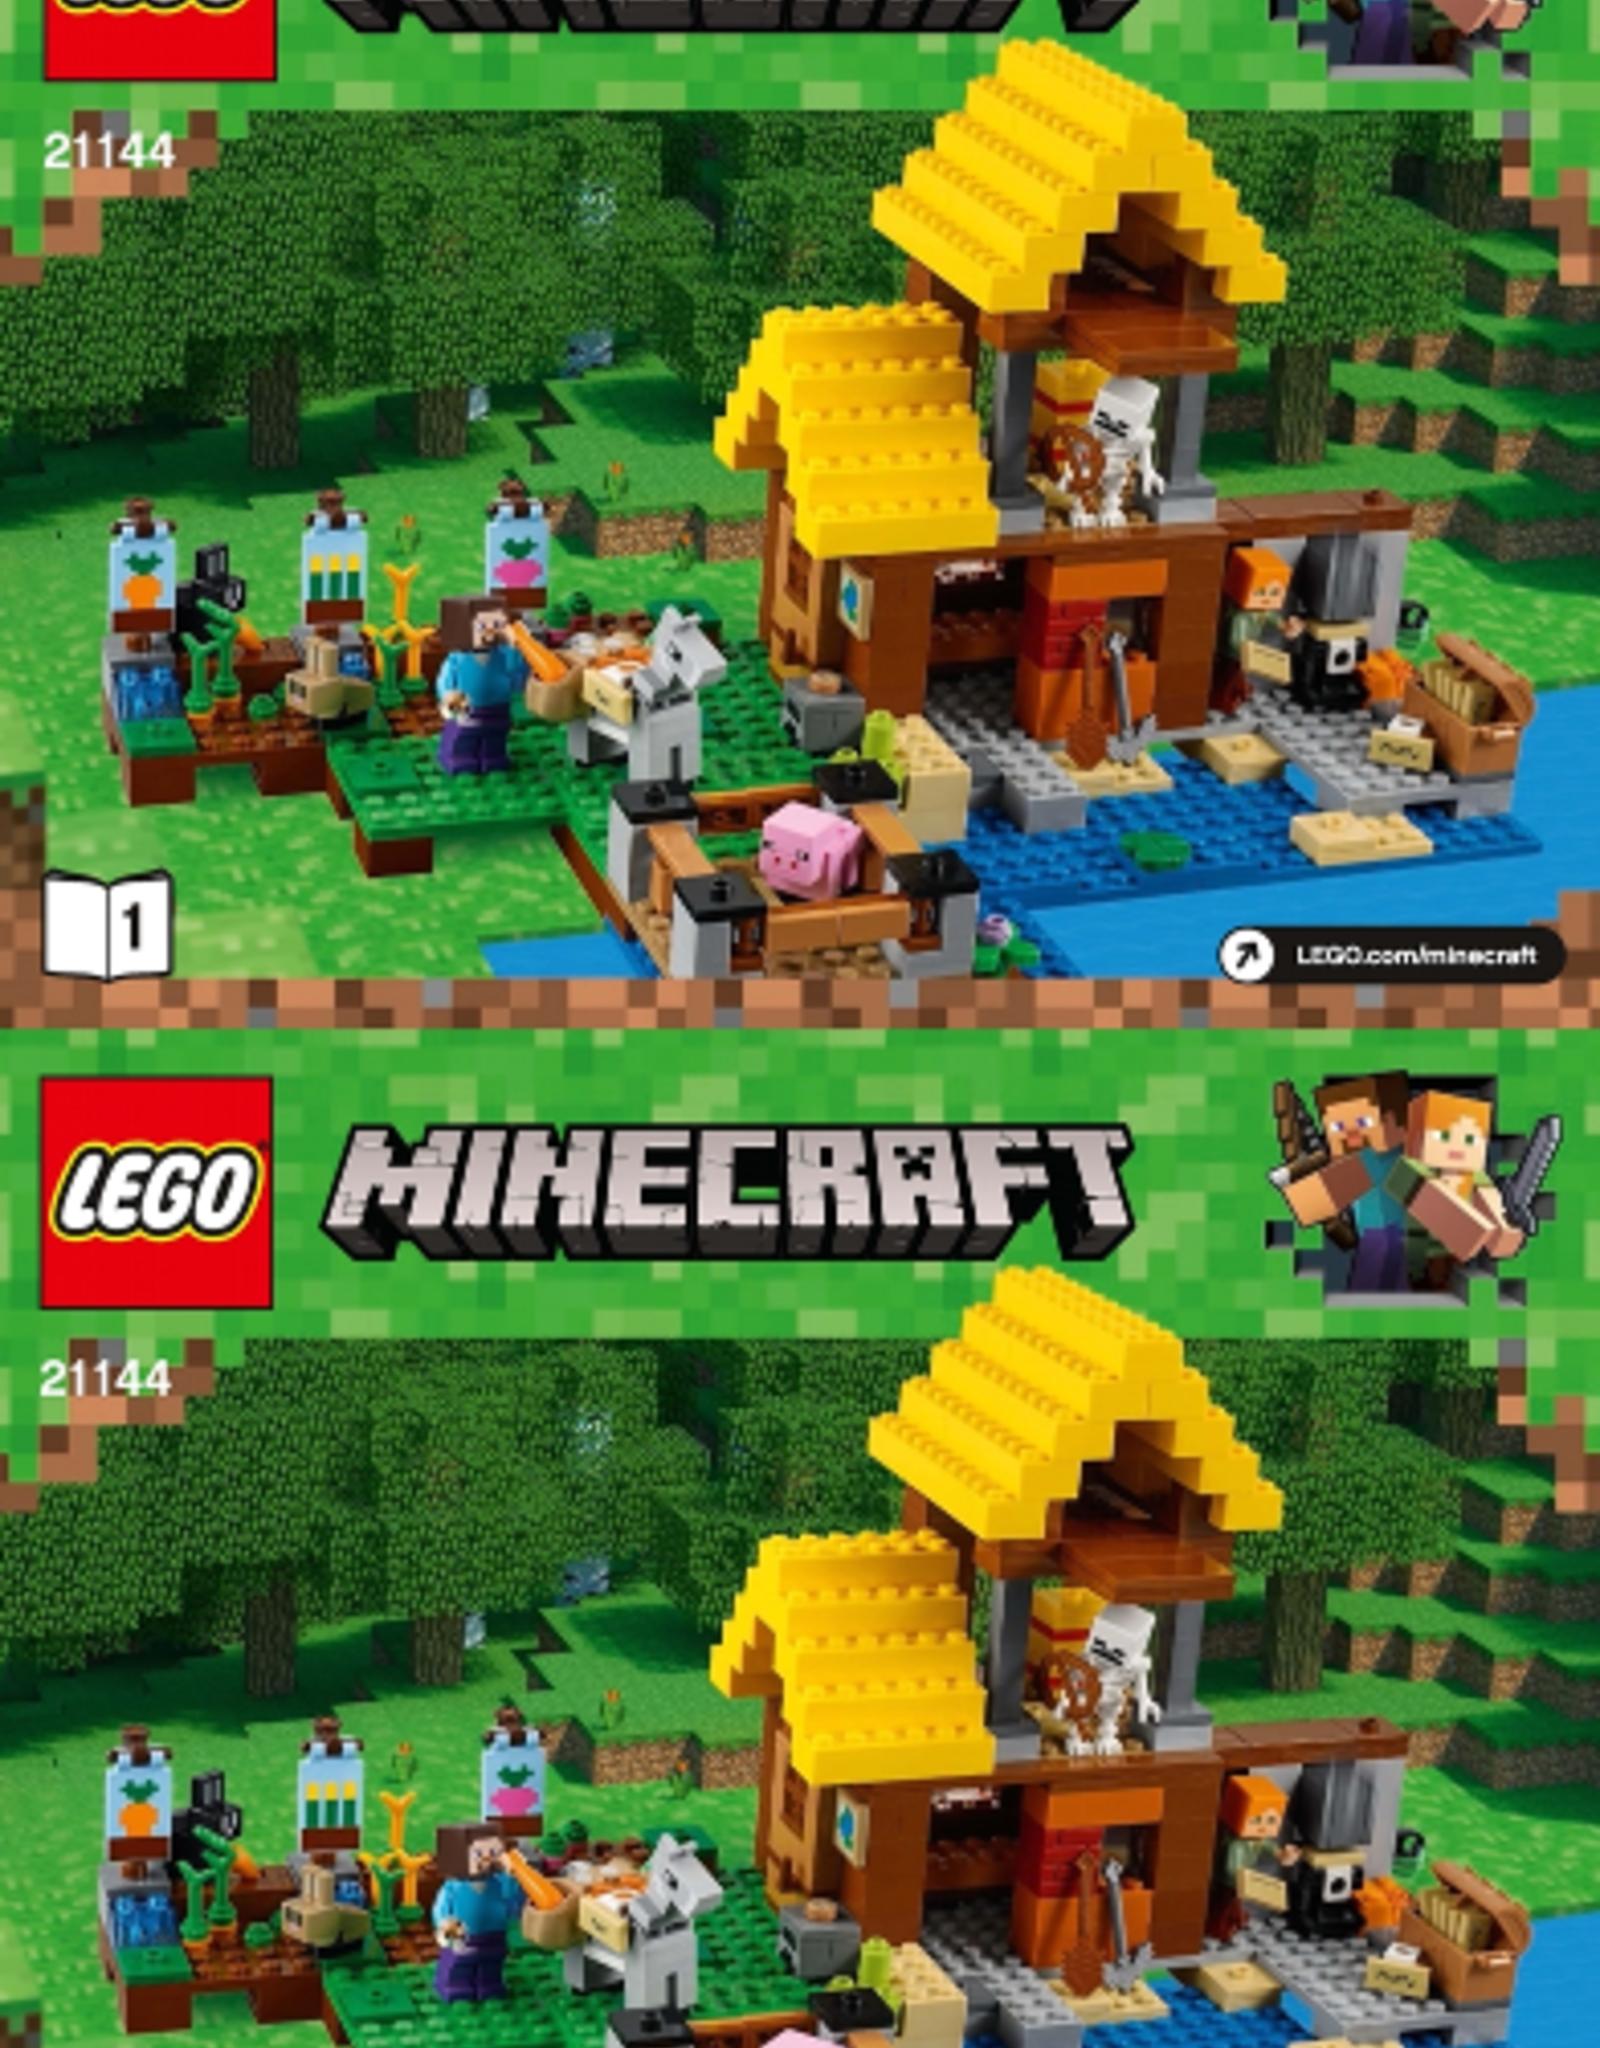 LEGO LEGO 21144 The Farm Cottage MINECRAFT